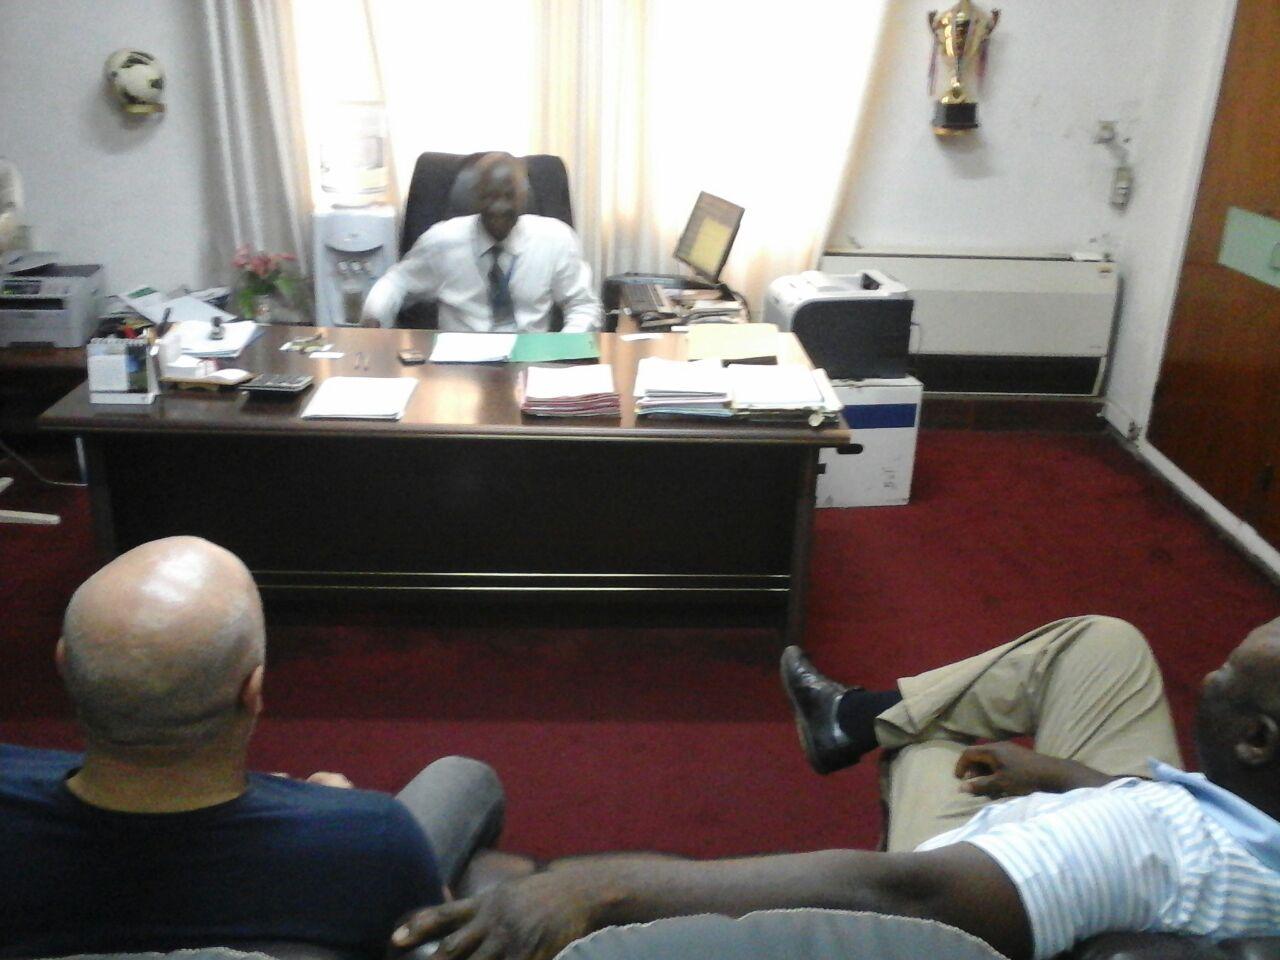 Mr boukpessi prsidenttogoport copie copie